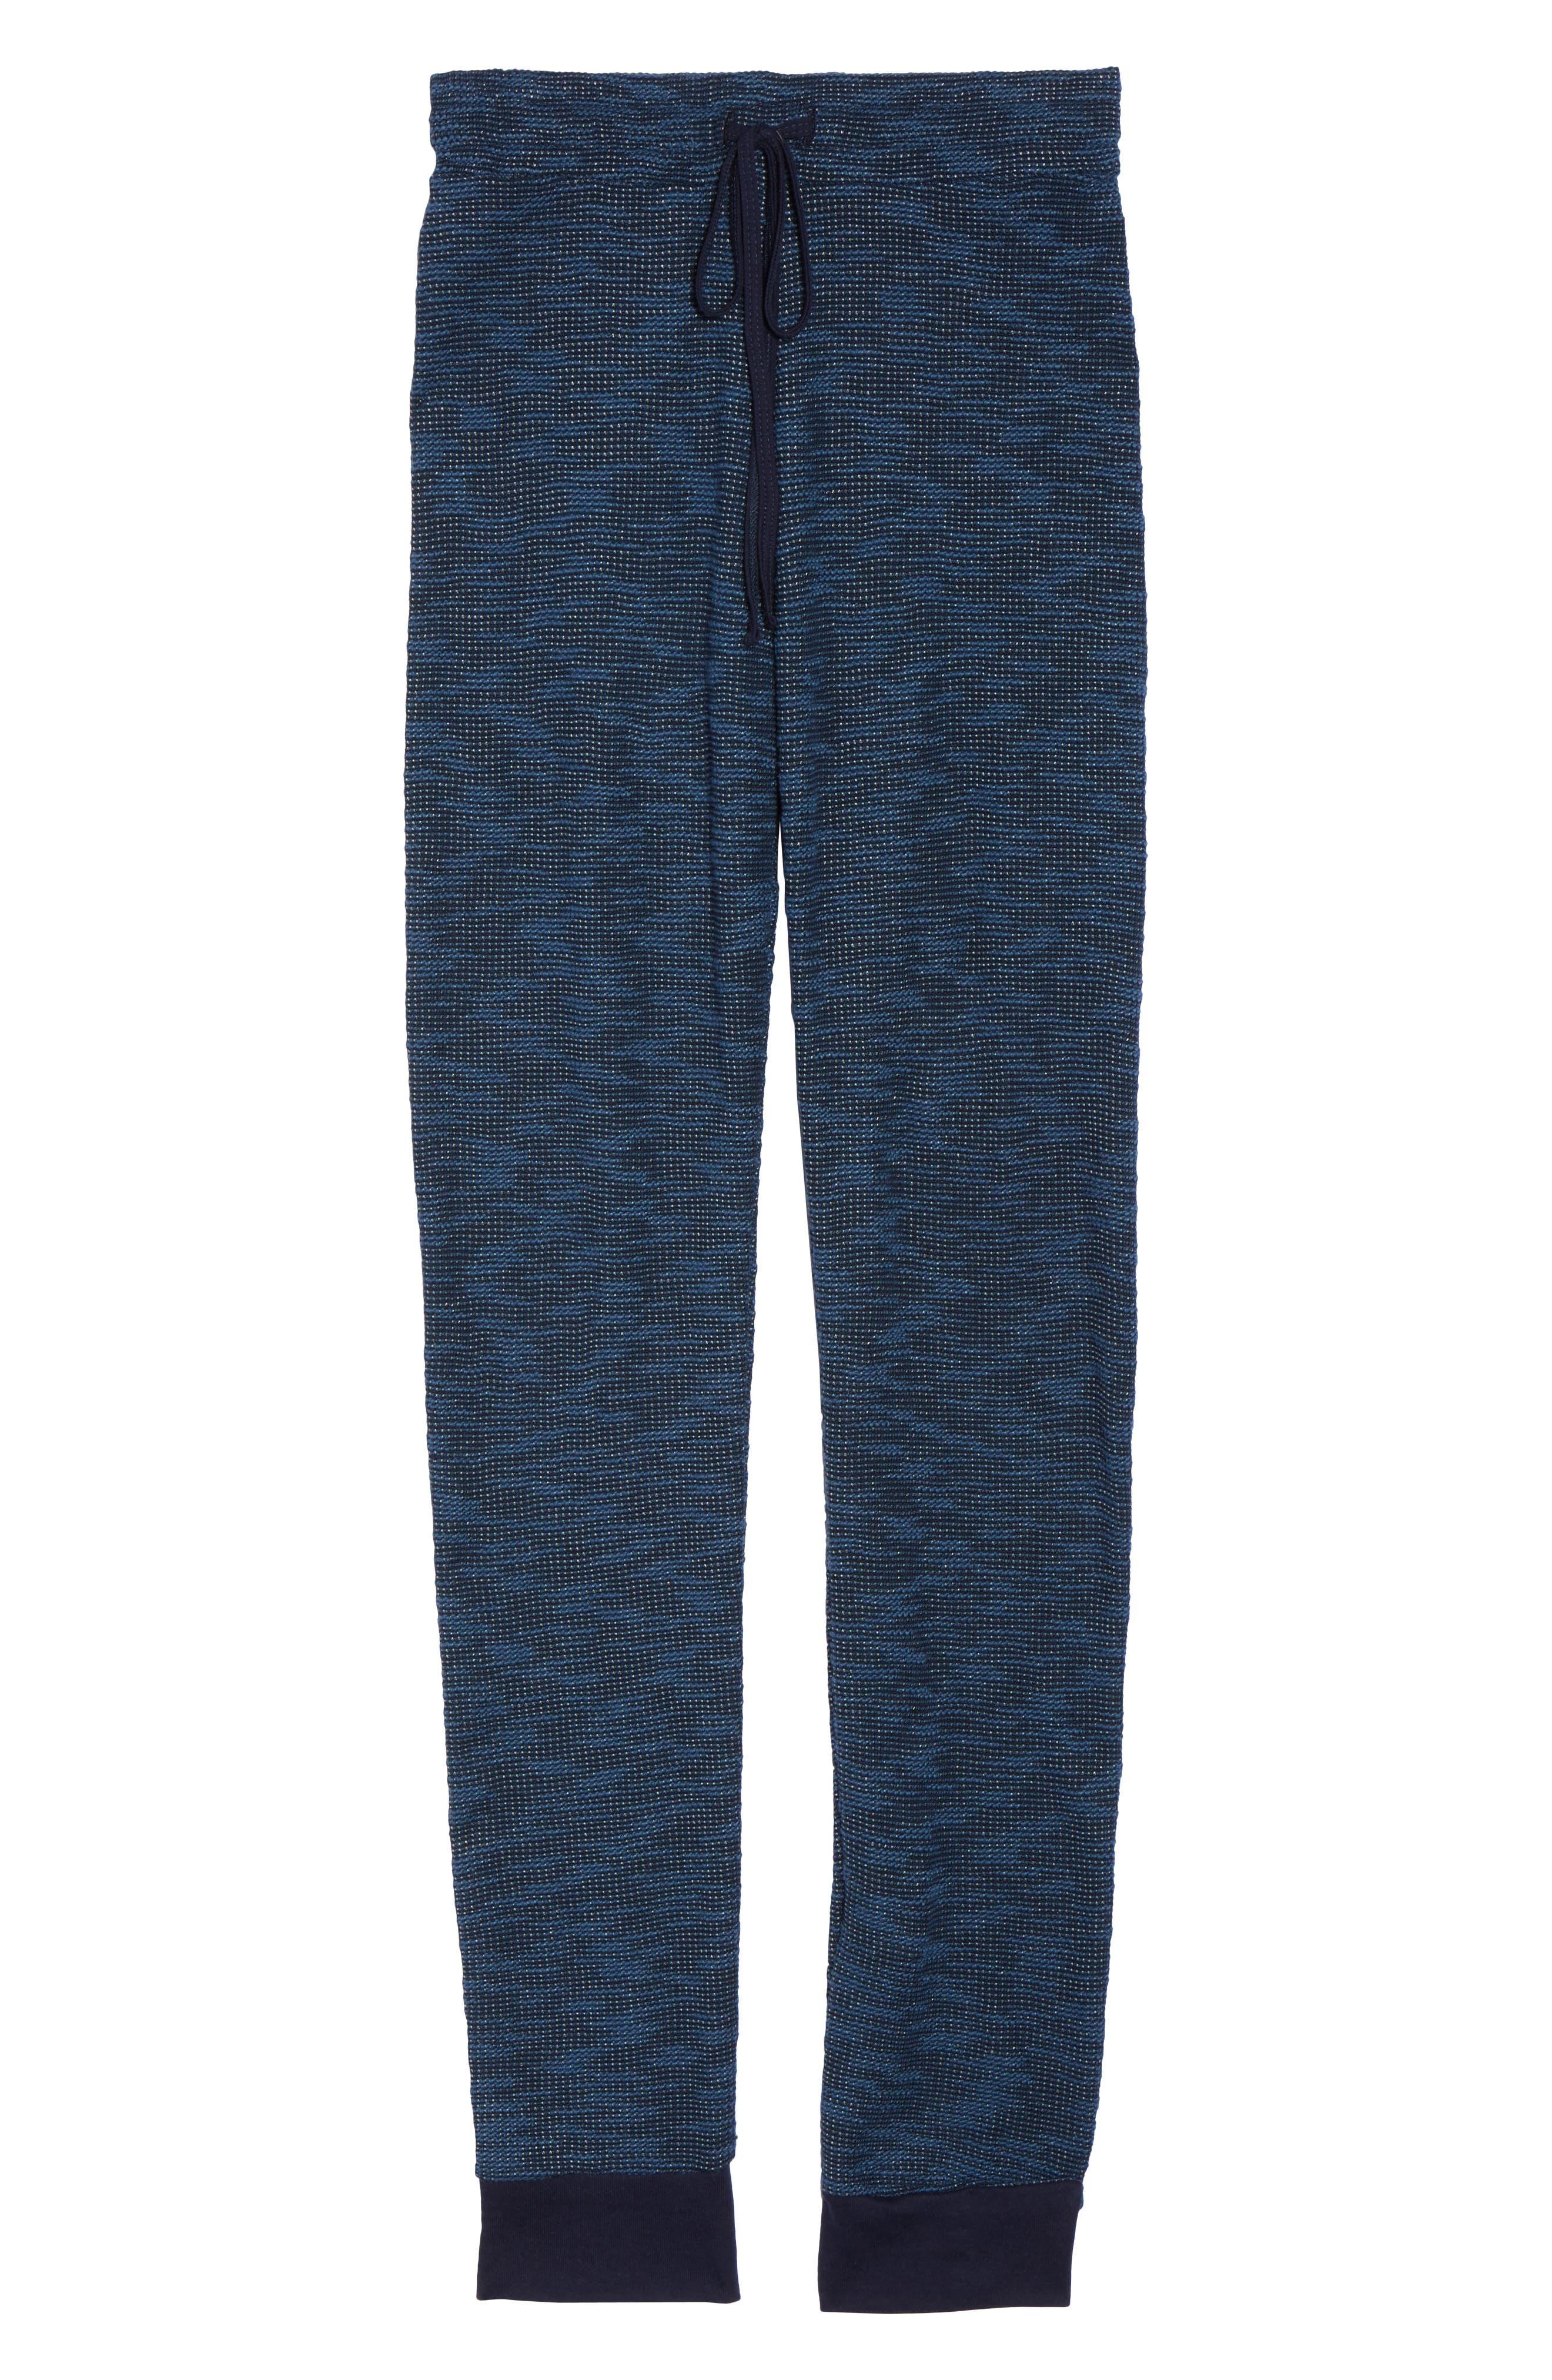 Stella Lounge Pants,                             Alternate thumbnail 12, color,